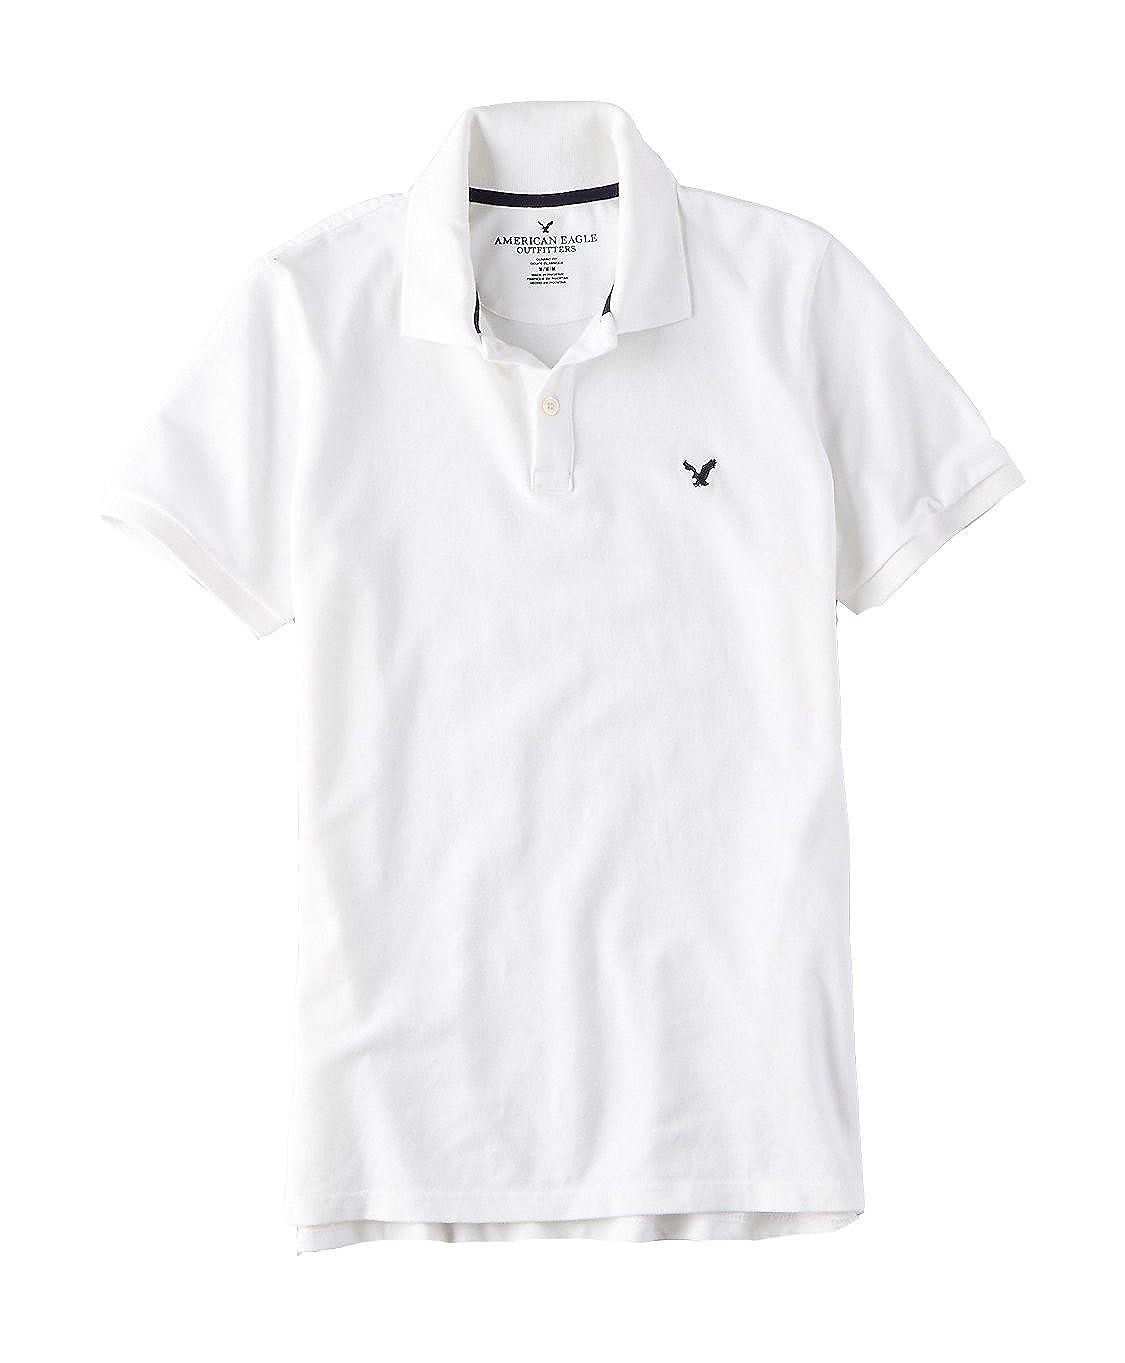 ff2c3907 American Eagle Polo Shirts Uk